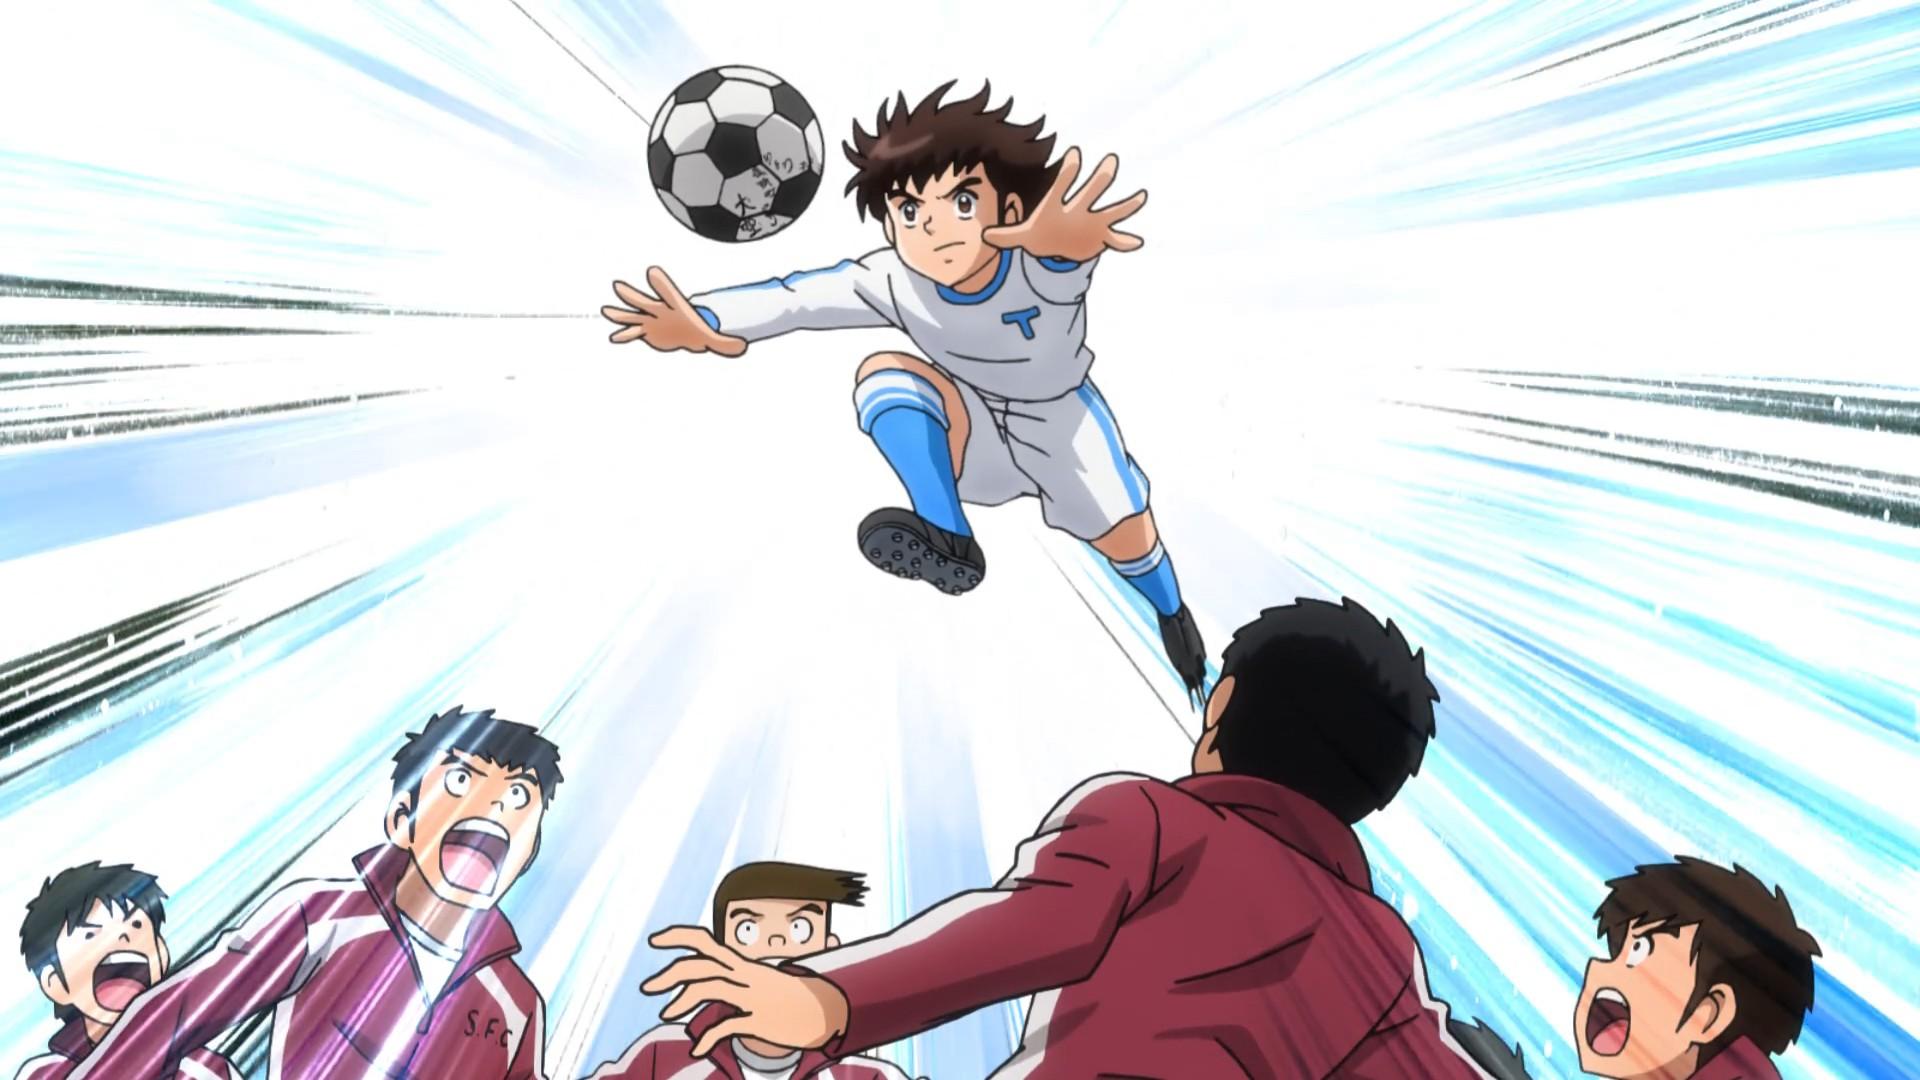 Captain Tsubasa 02 06 Lost In Anime